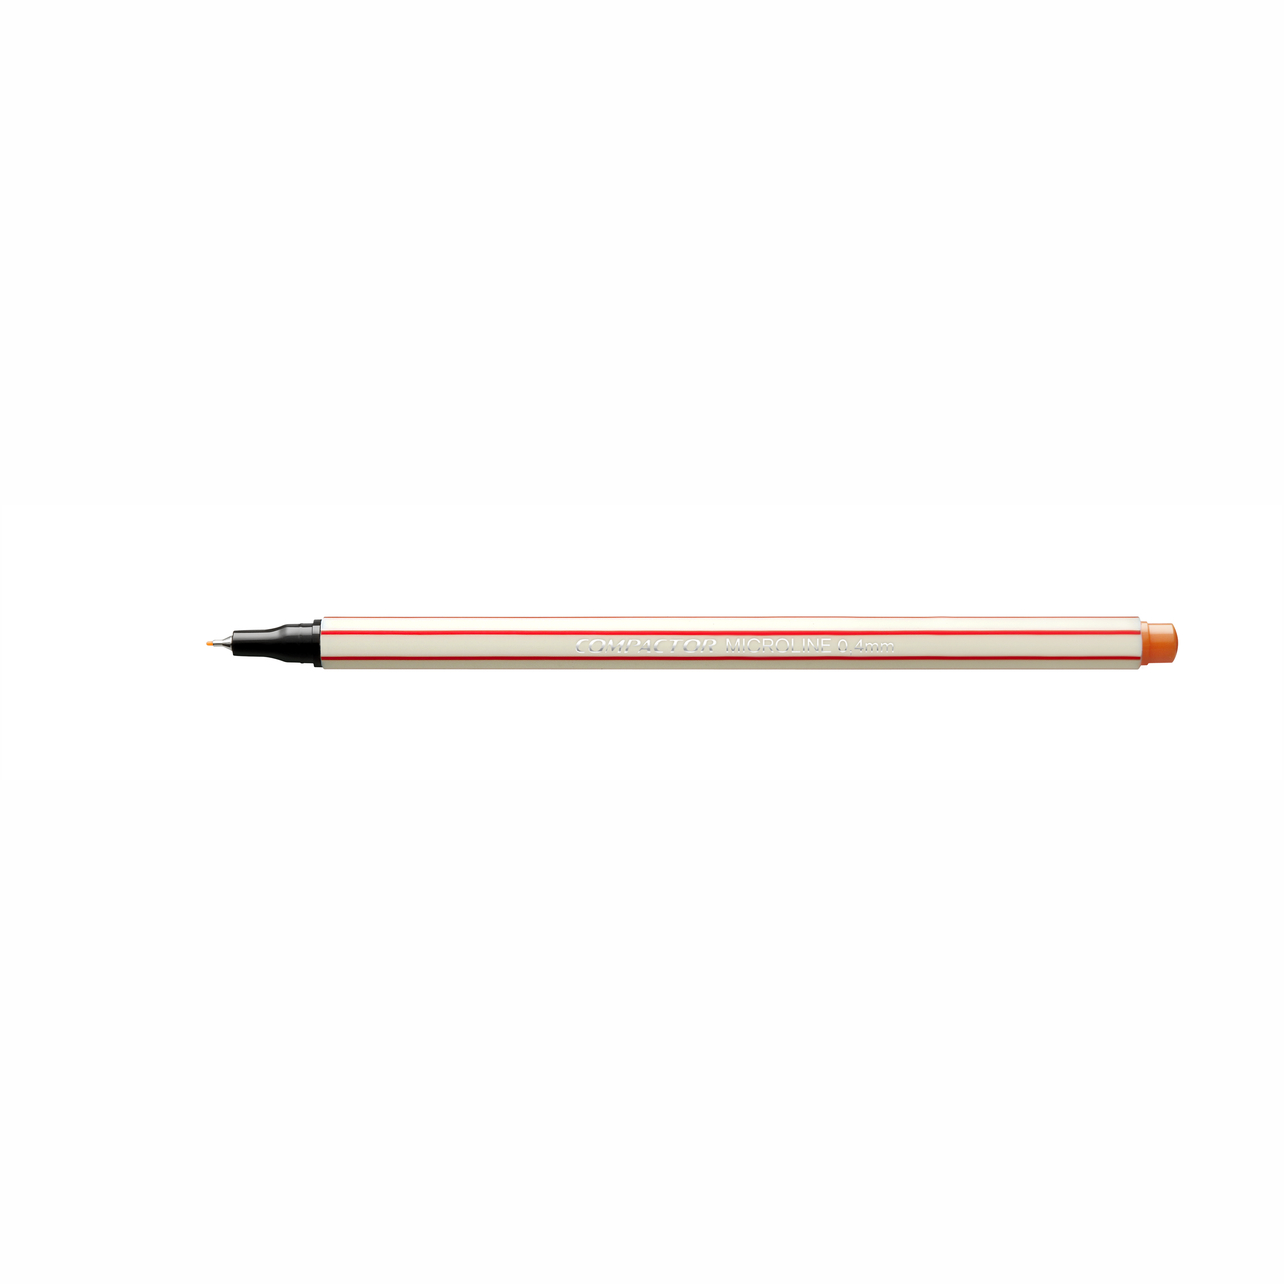 Caneta Hidrográfica 0.4 laranja MICROLINE Compactor